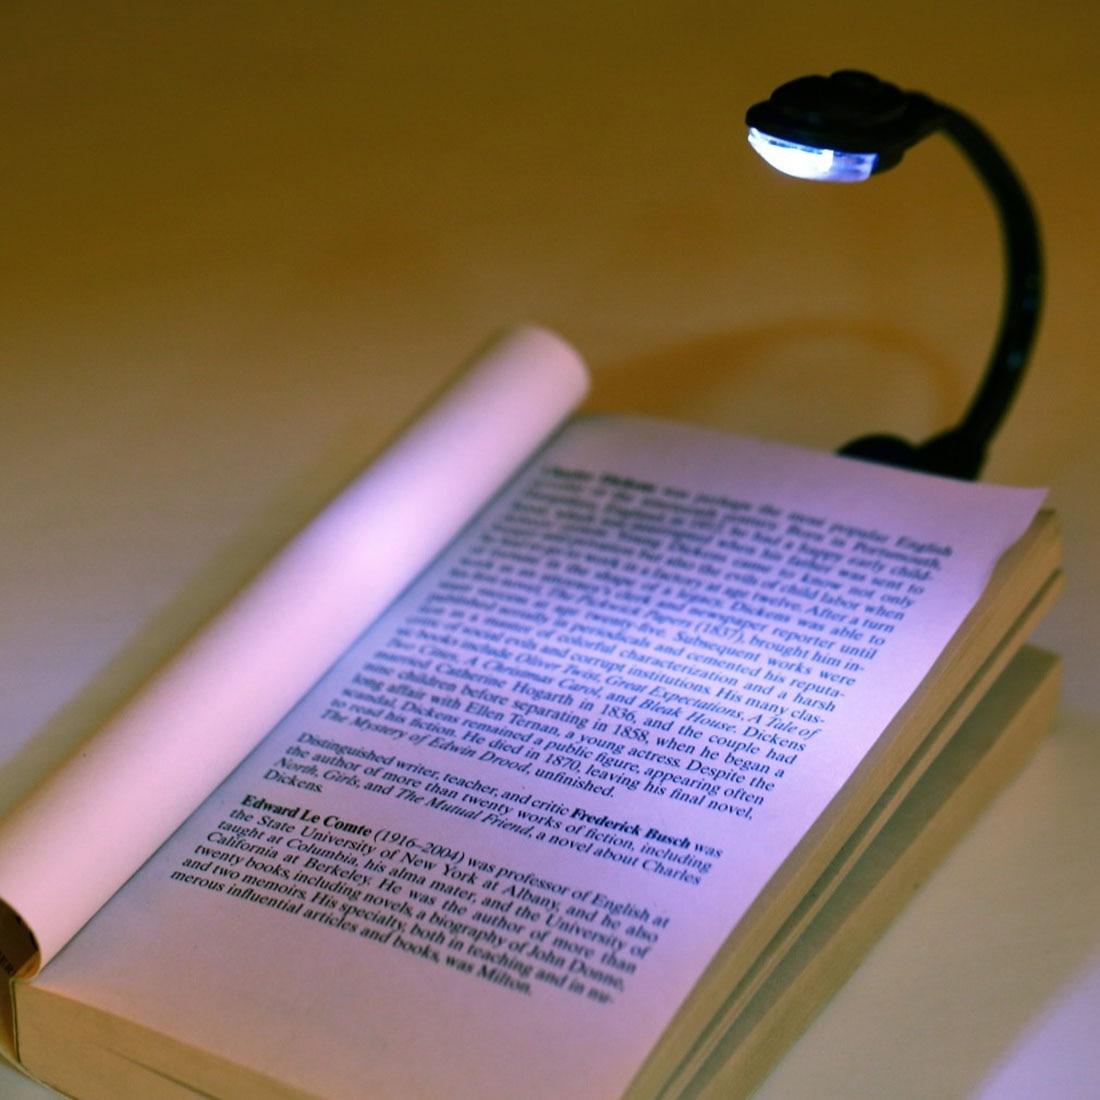 Hot Adjustable Clip Mini Portable LED Book Reading Light Lamp Flexible USB Novelty Light for Laptop PC Music Stand Light Lamp